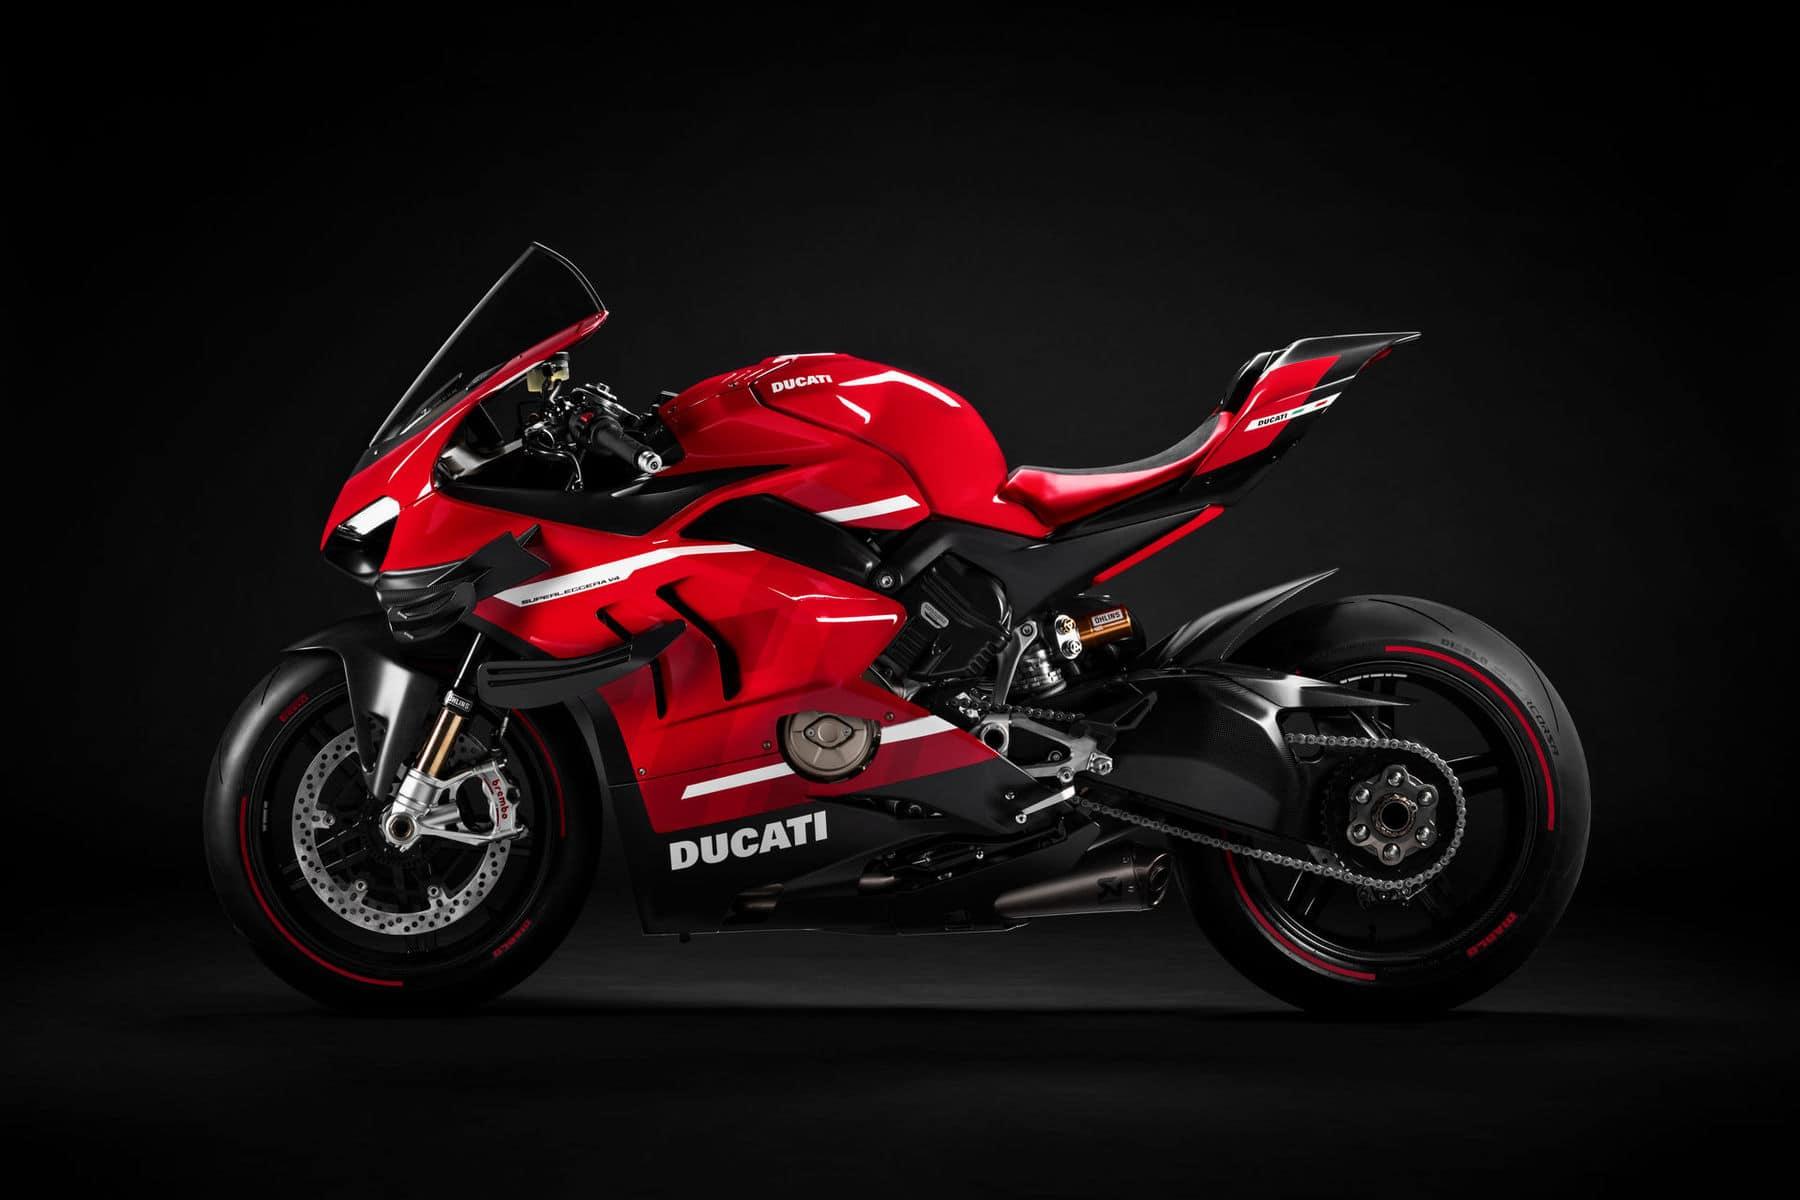 Ducati-Superleggerra-V4-9 3